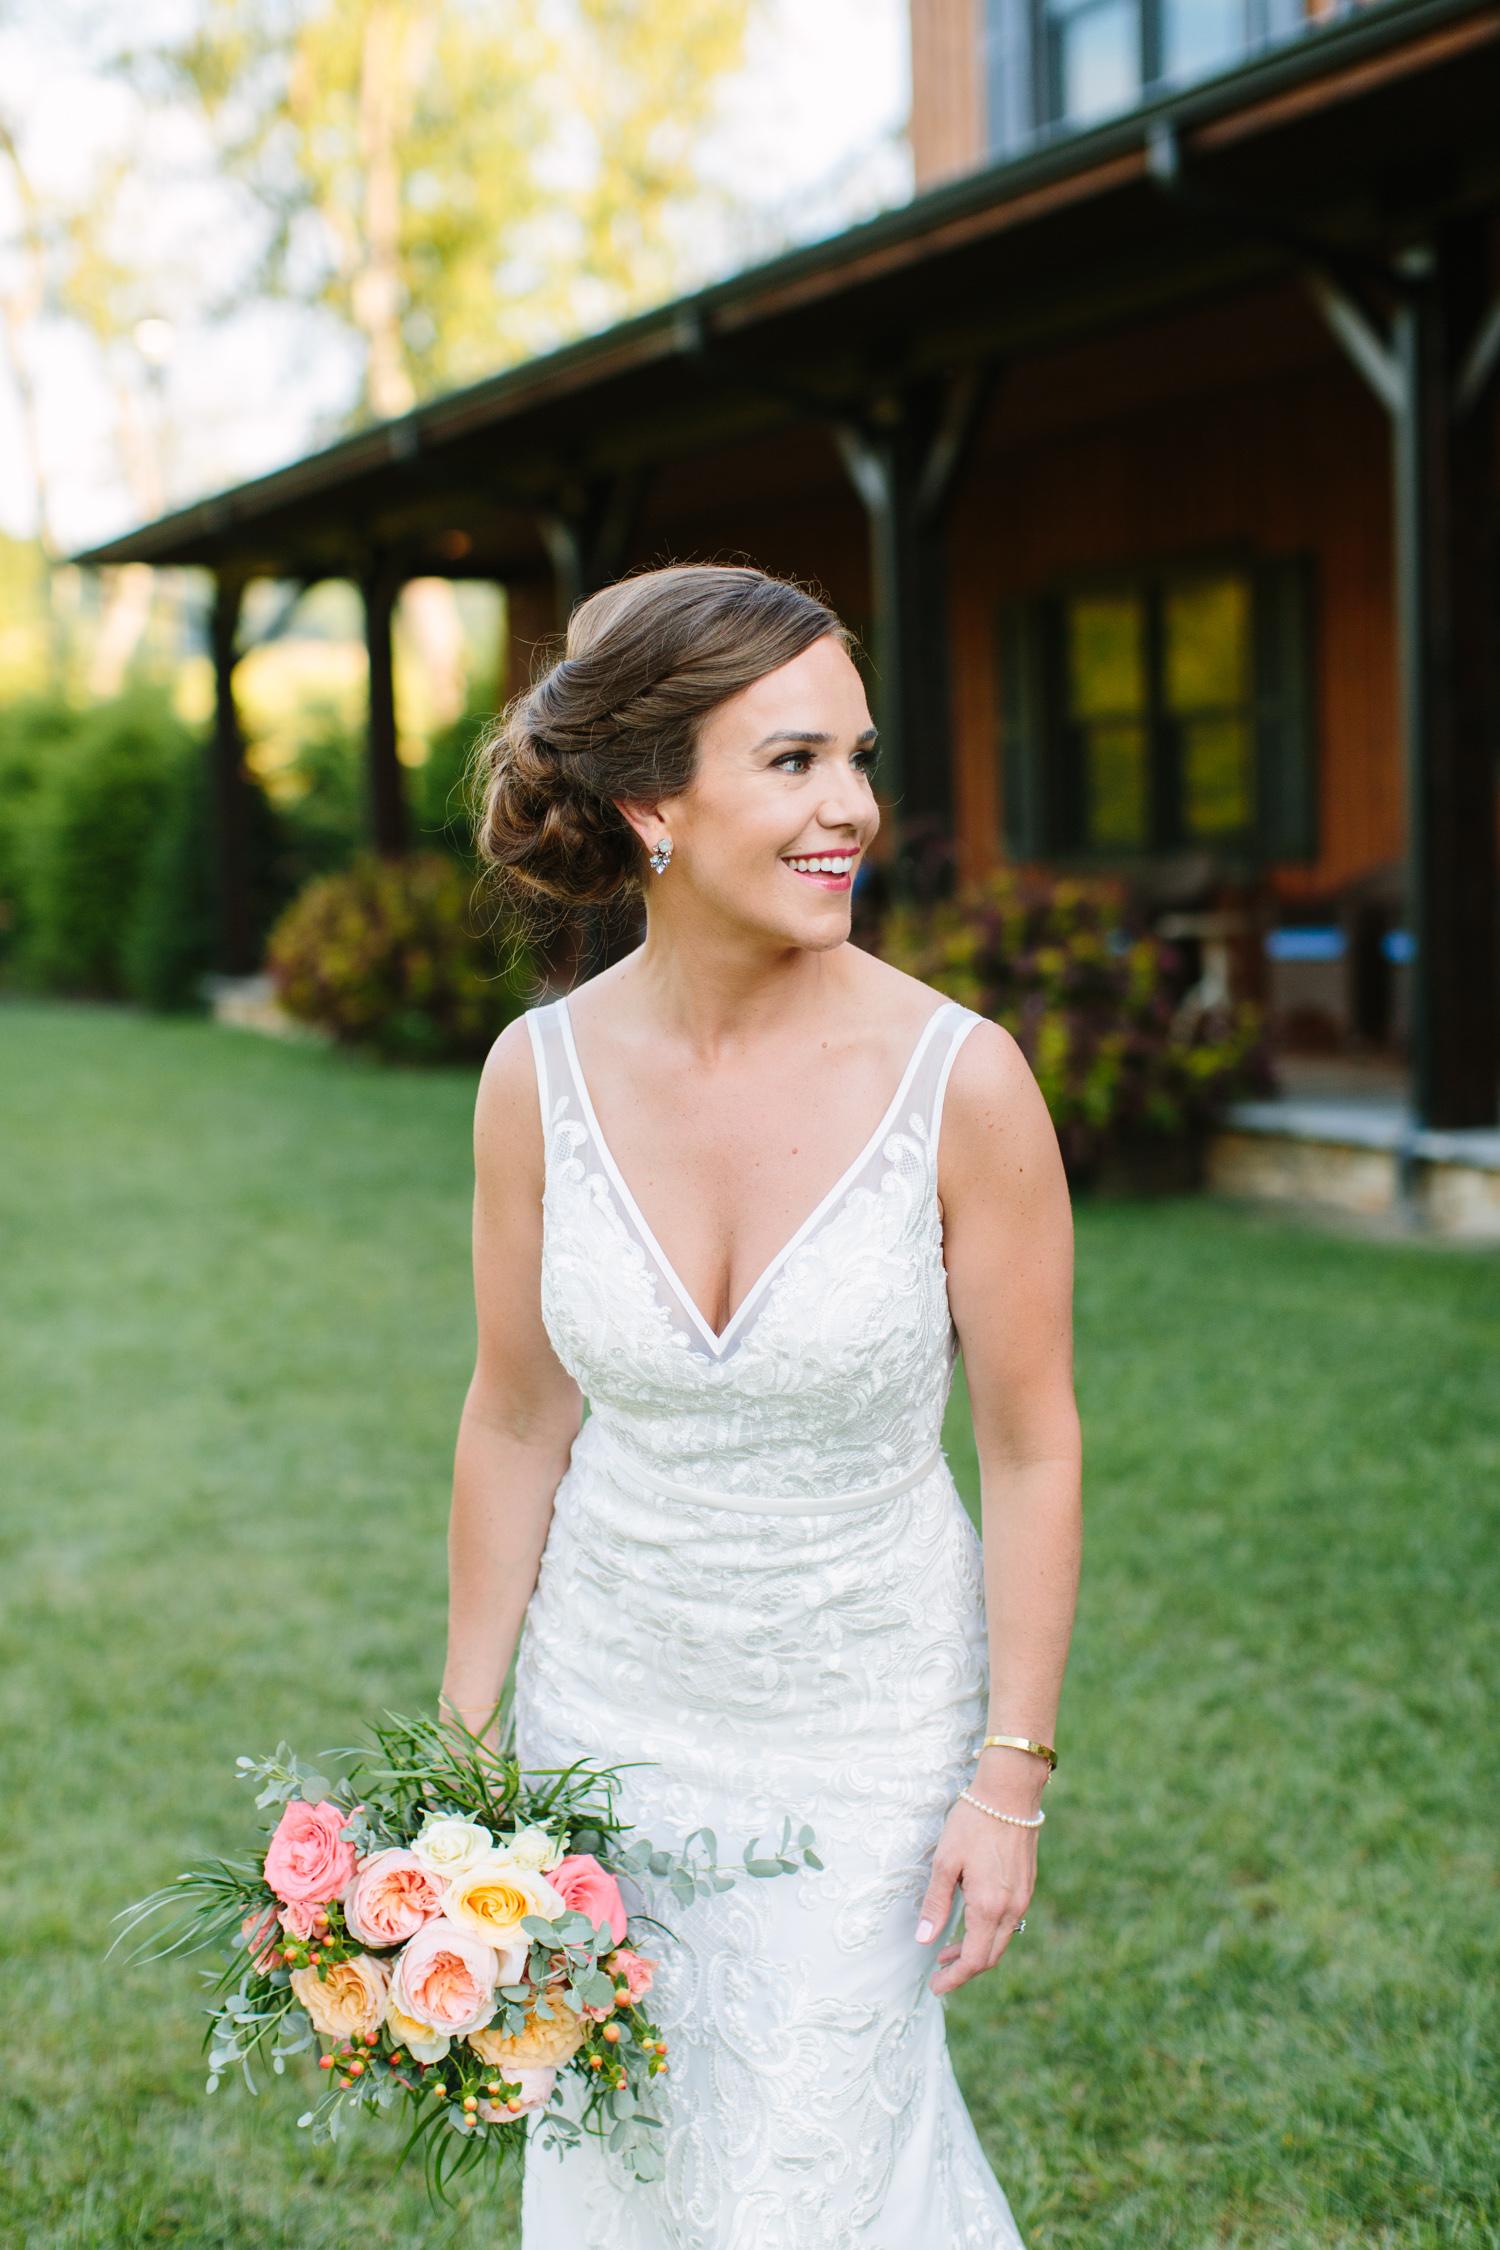 Bridal Portraits Romantic Pavilion Wedding // Tennessee Photographer // Suzy Collins Photography // The Olde Farm